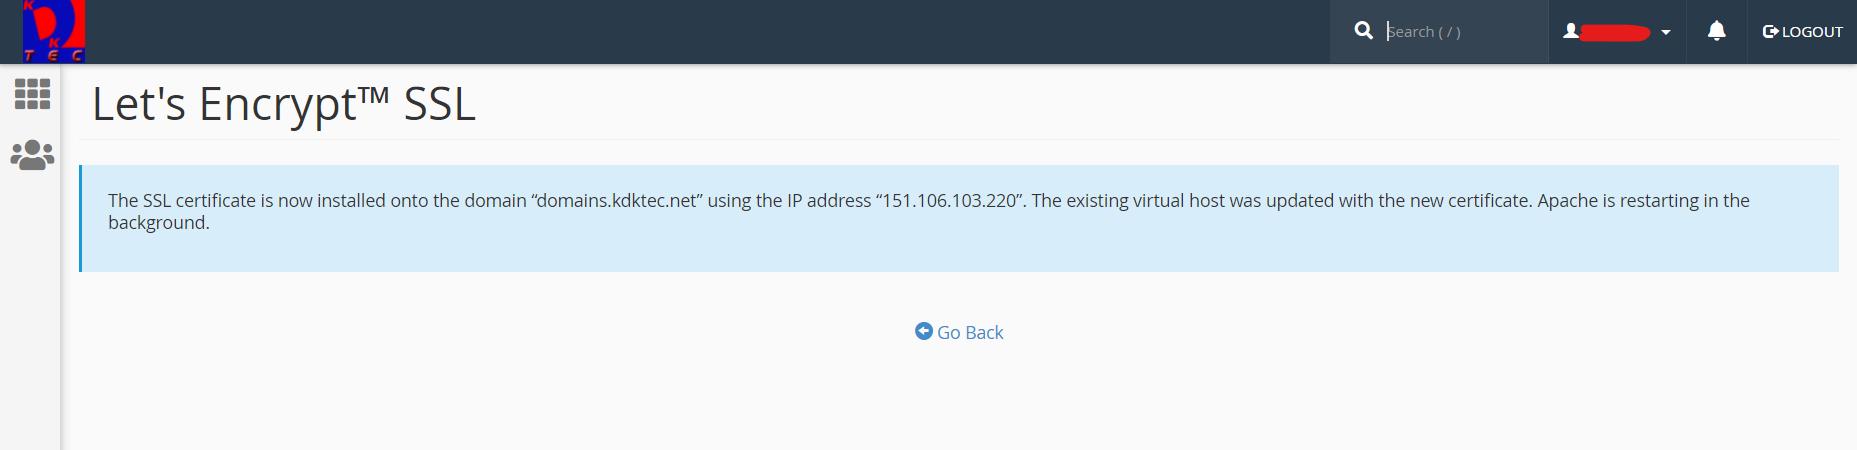 Let's Encrypt SSL certificate installation success message